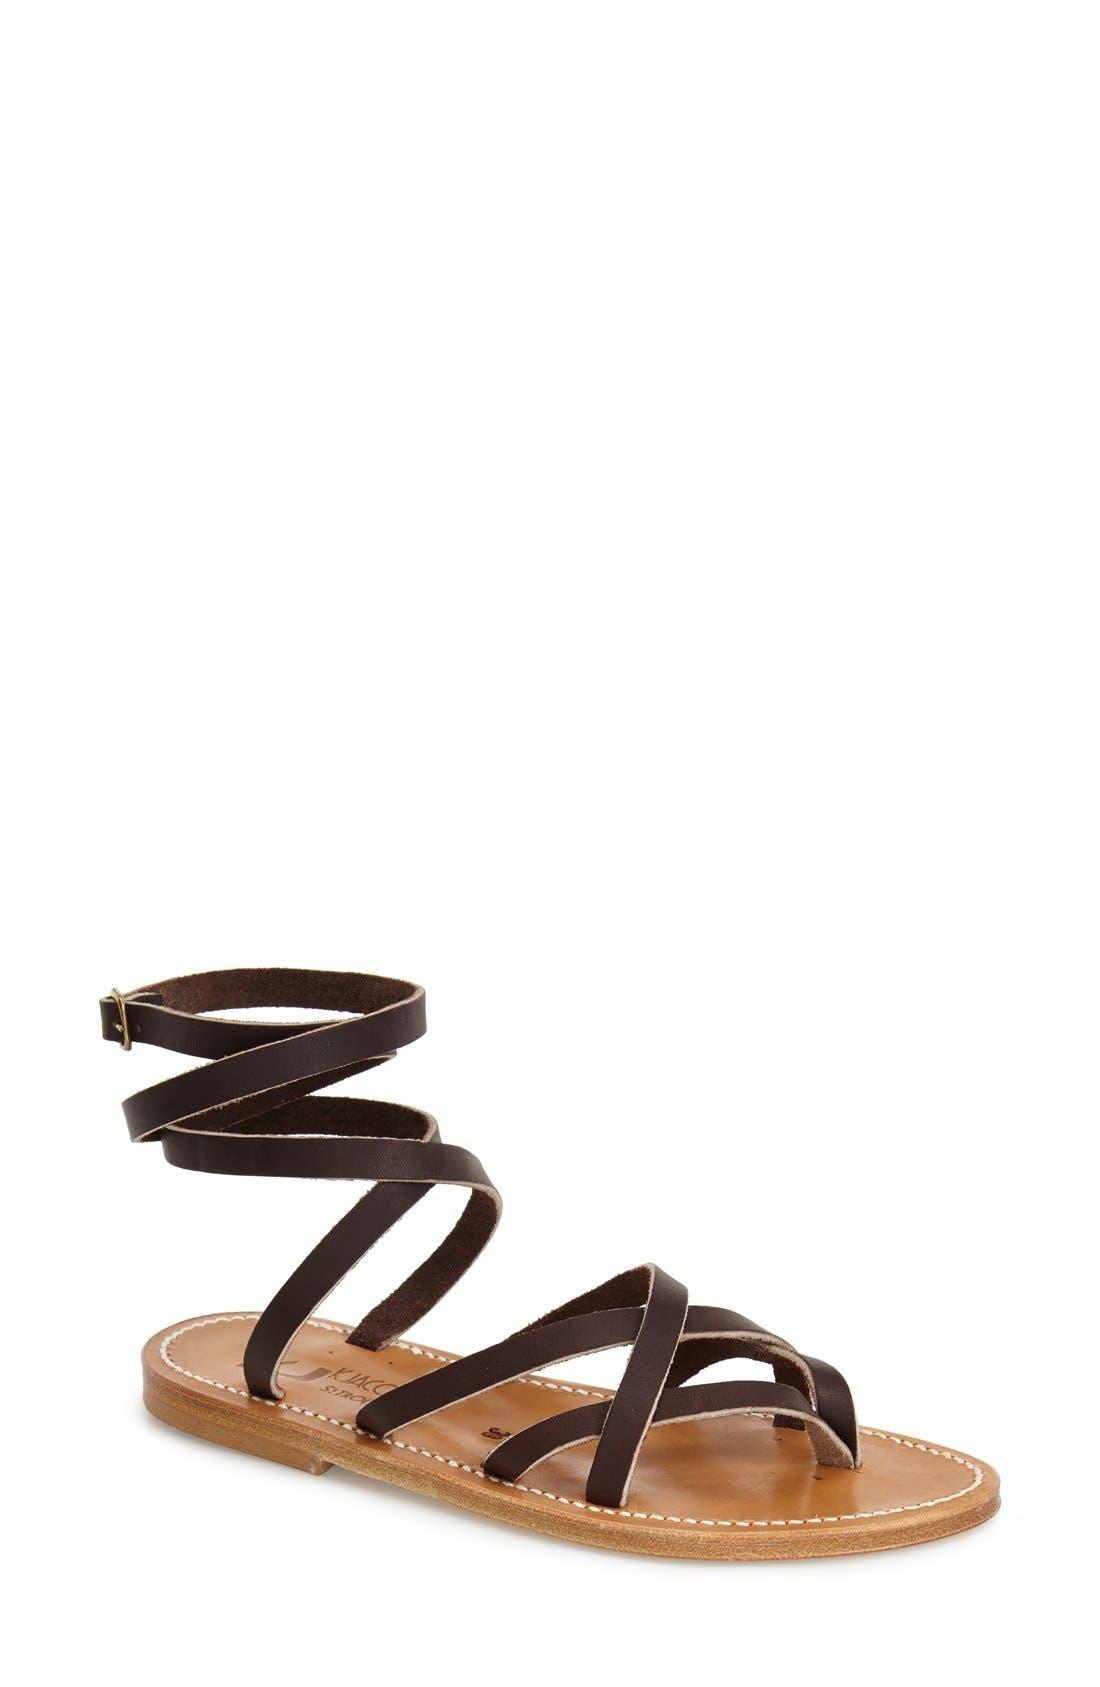 Alternate Image 1 Selected - K.Jacques St. Tropez 'Zenobie' Ankle Wrap Sandal (Women)